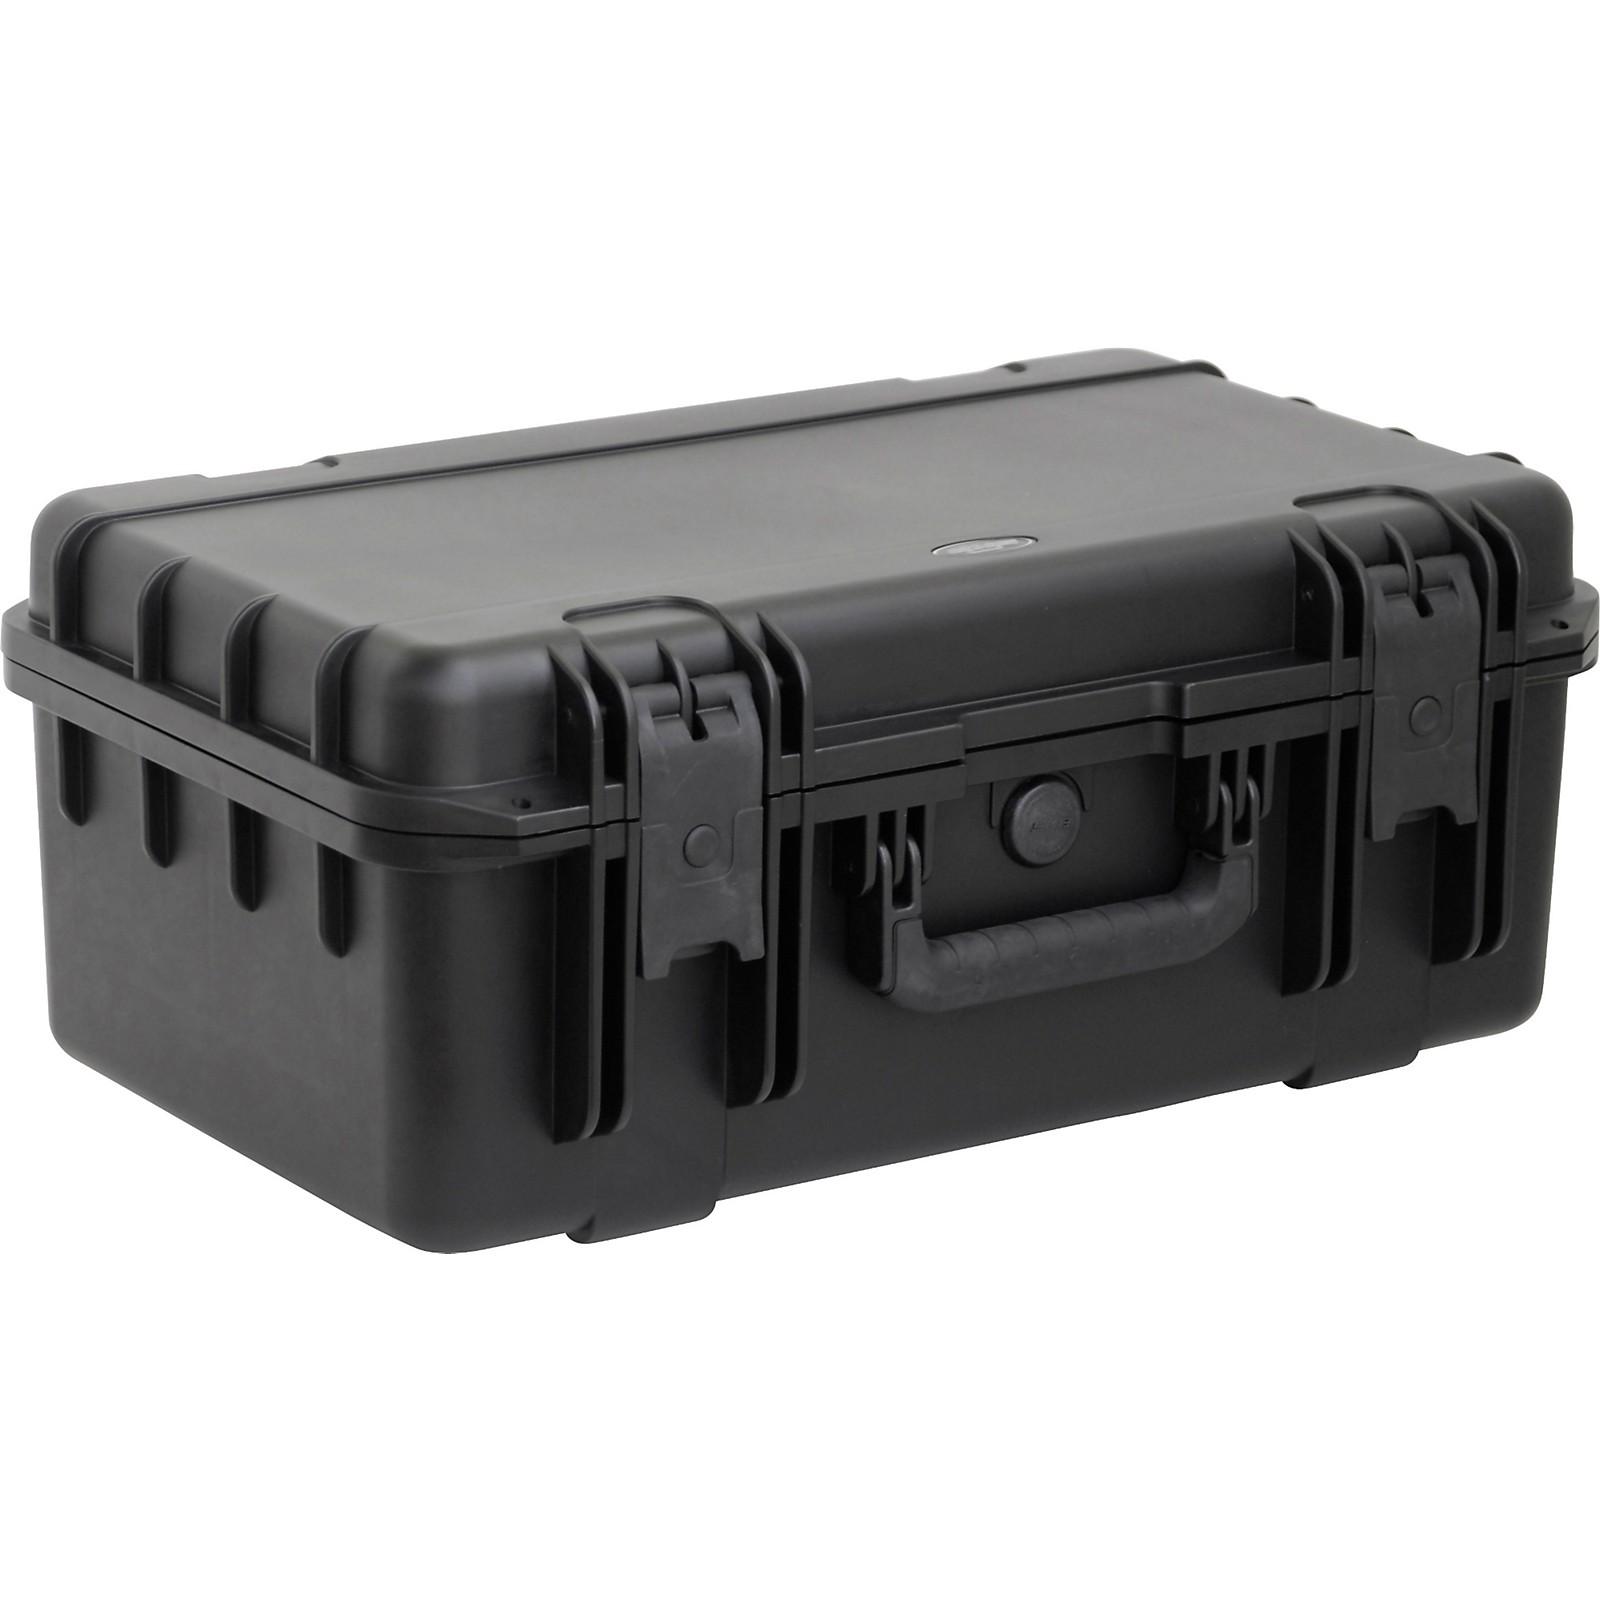 Open Box SKB 3i-2011-8B Military Standard Waterproof Case